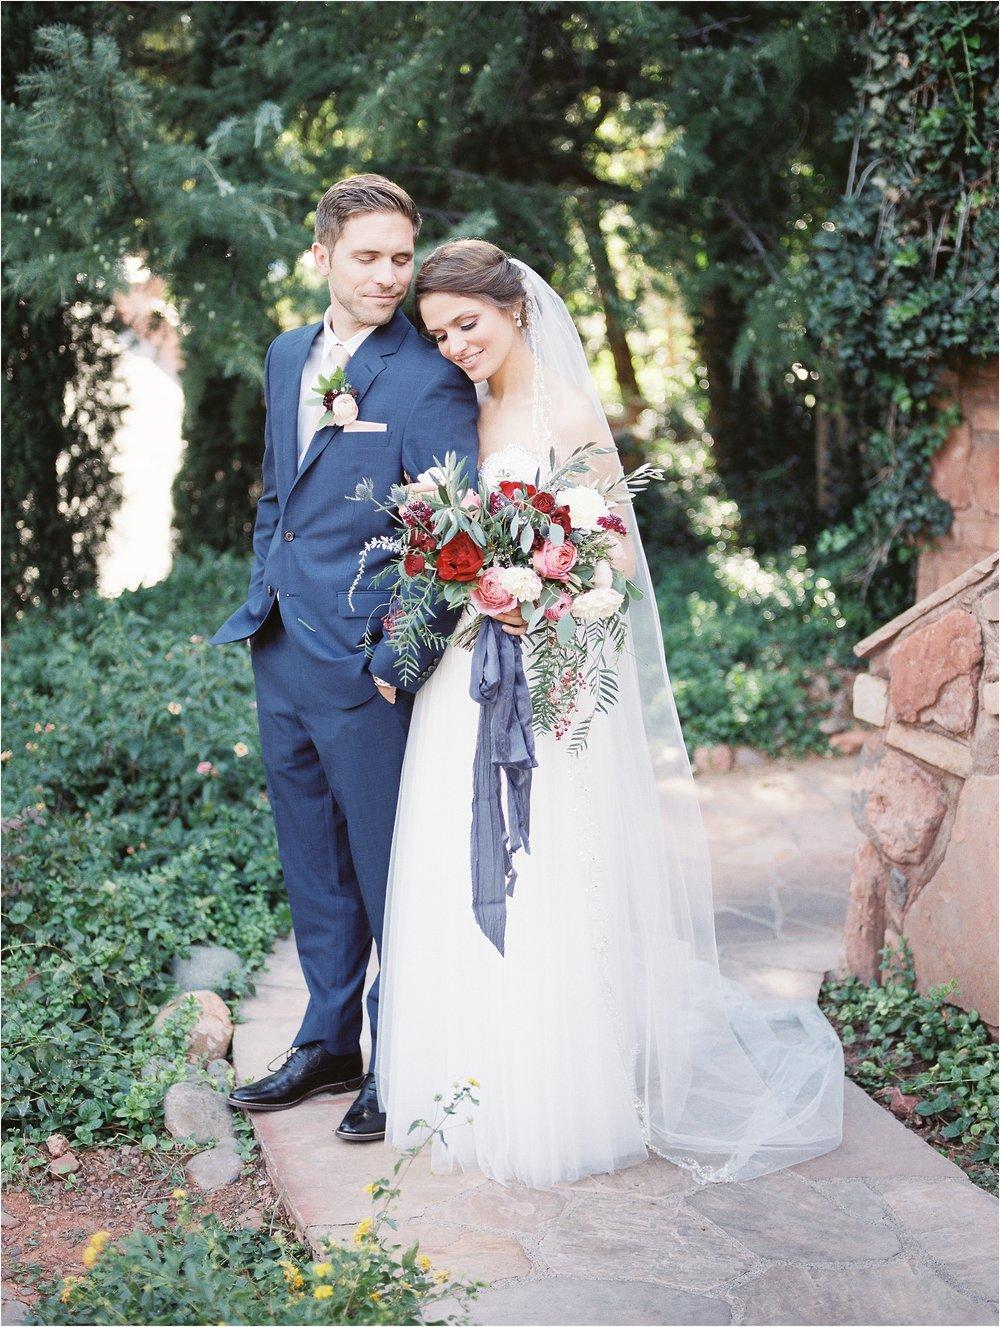 Sarah Jane Photography Film Hybrid Scottsdale Phoenix Arizona Destination Wedding Photographer sedona lauberge jon paige_0032.jpg